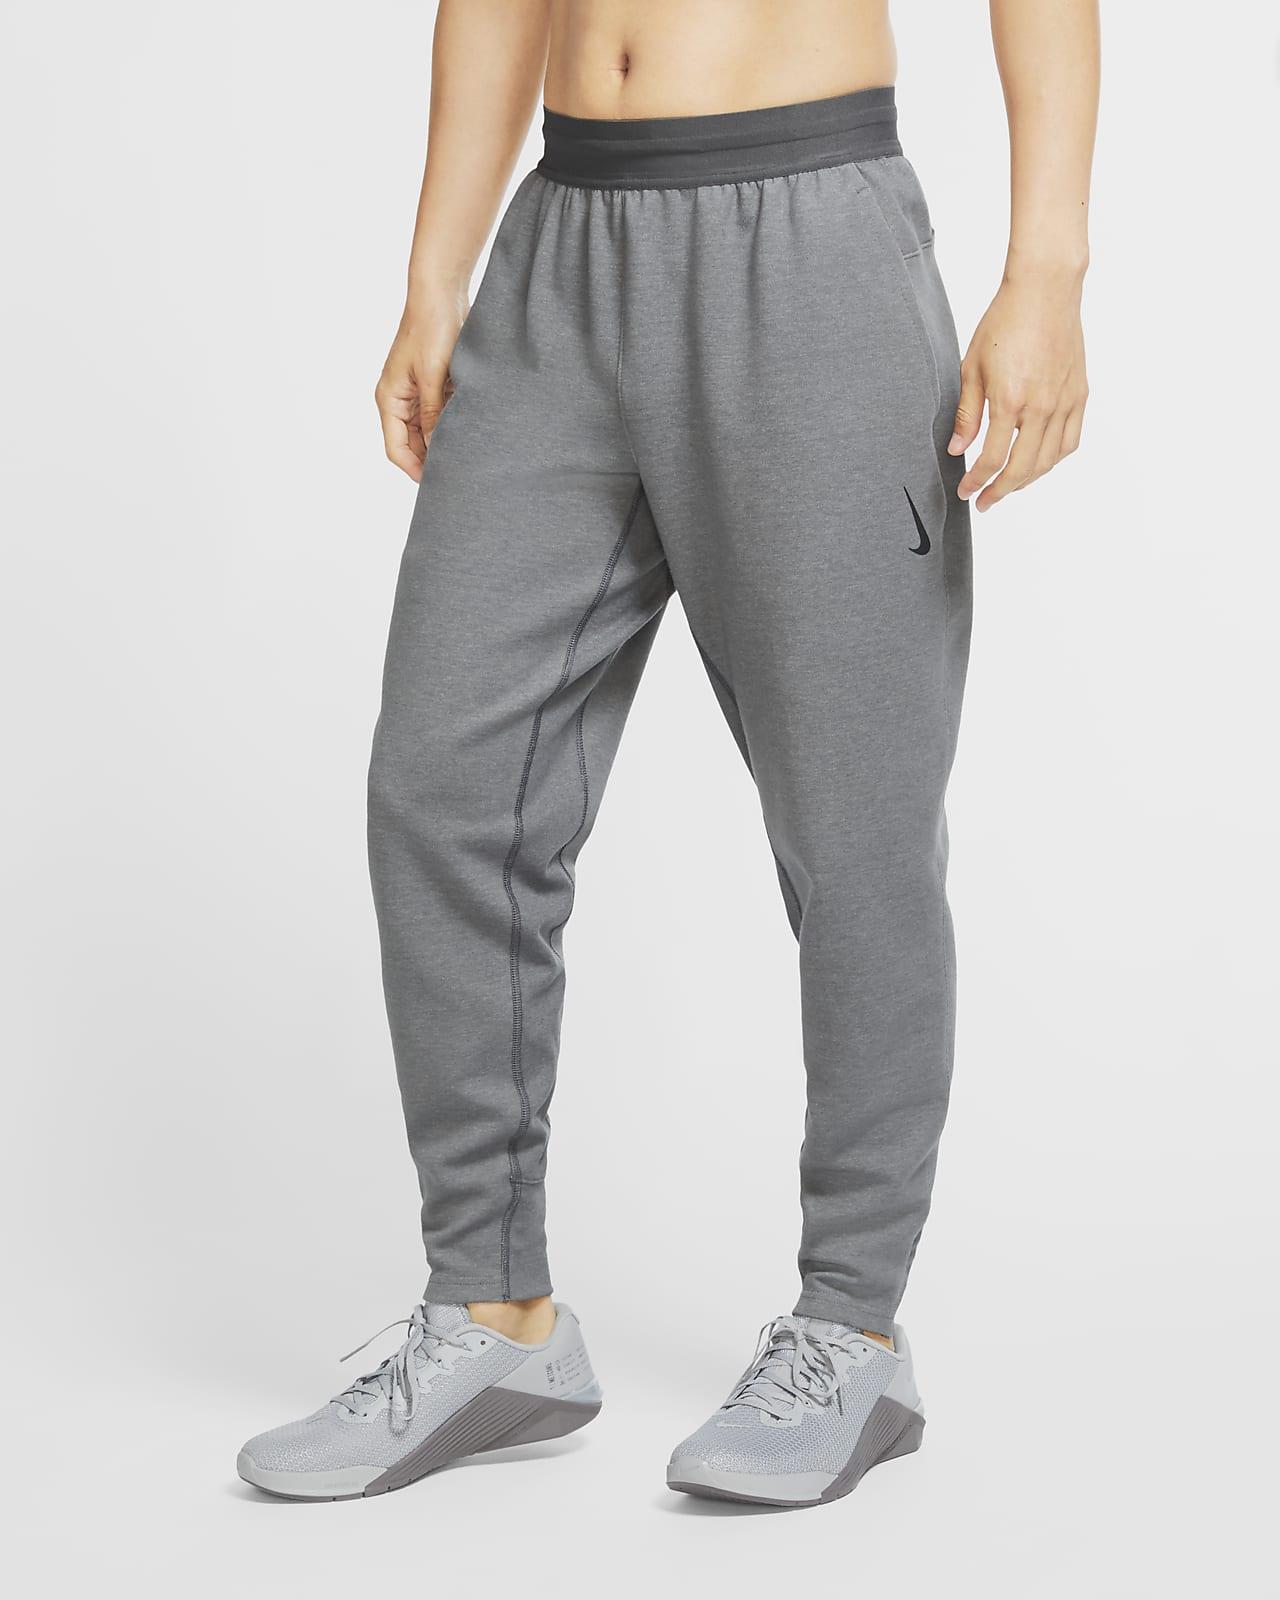 Мужские брюки Nike Yoga